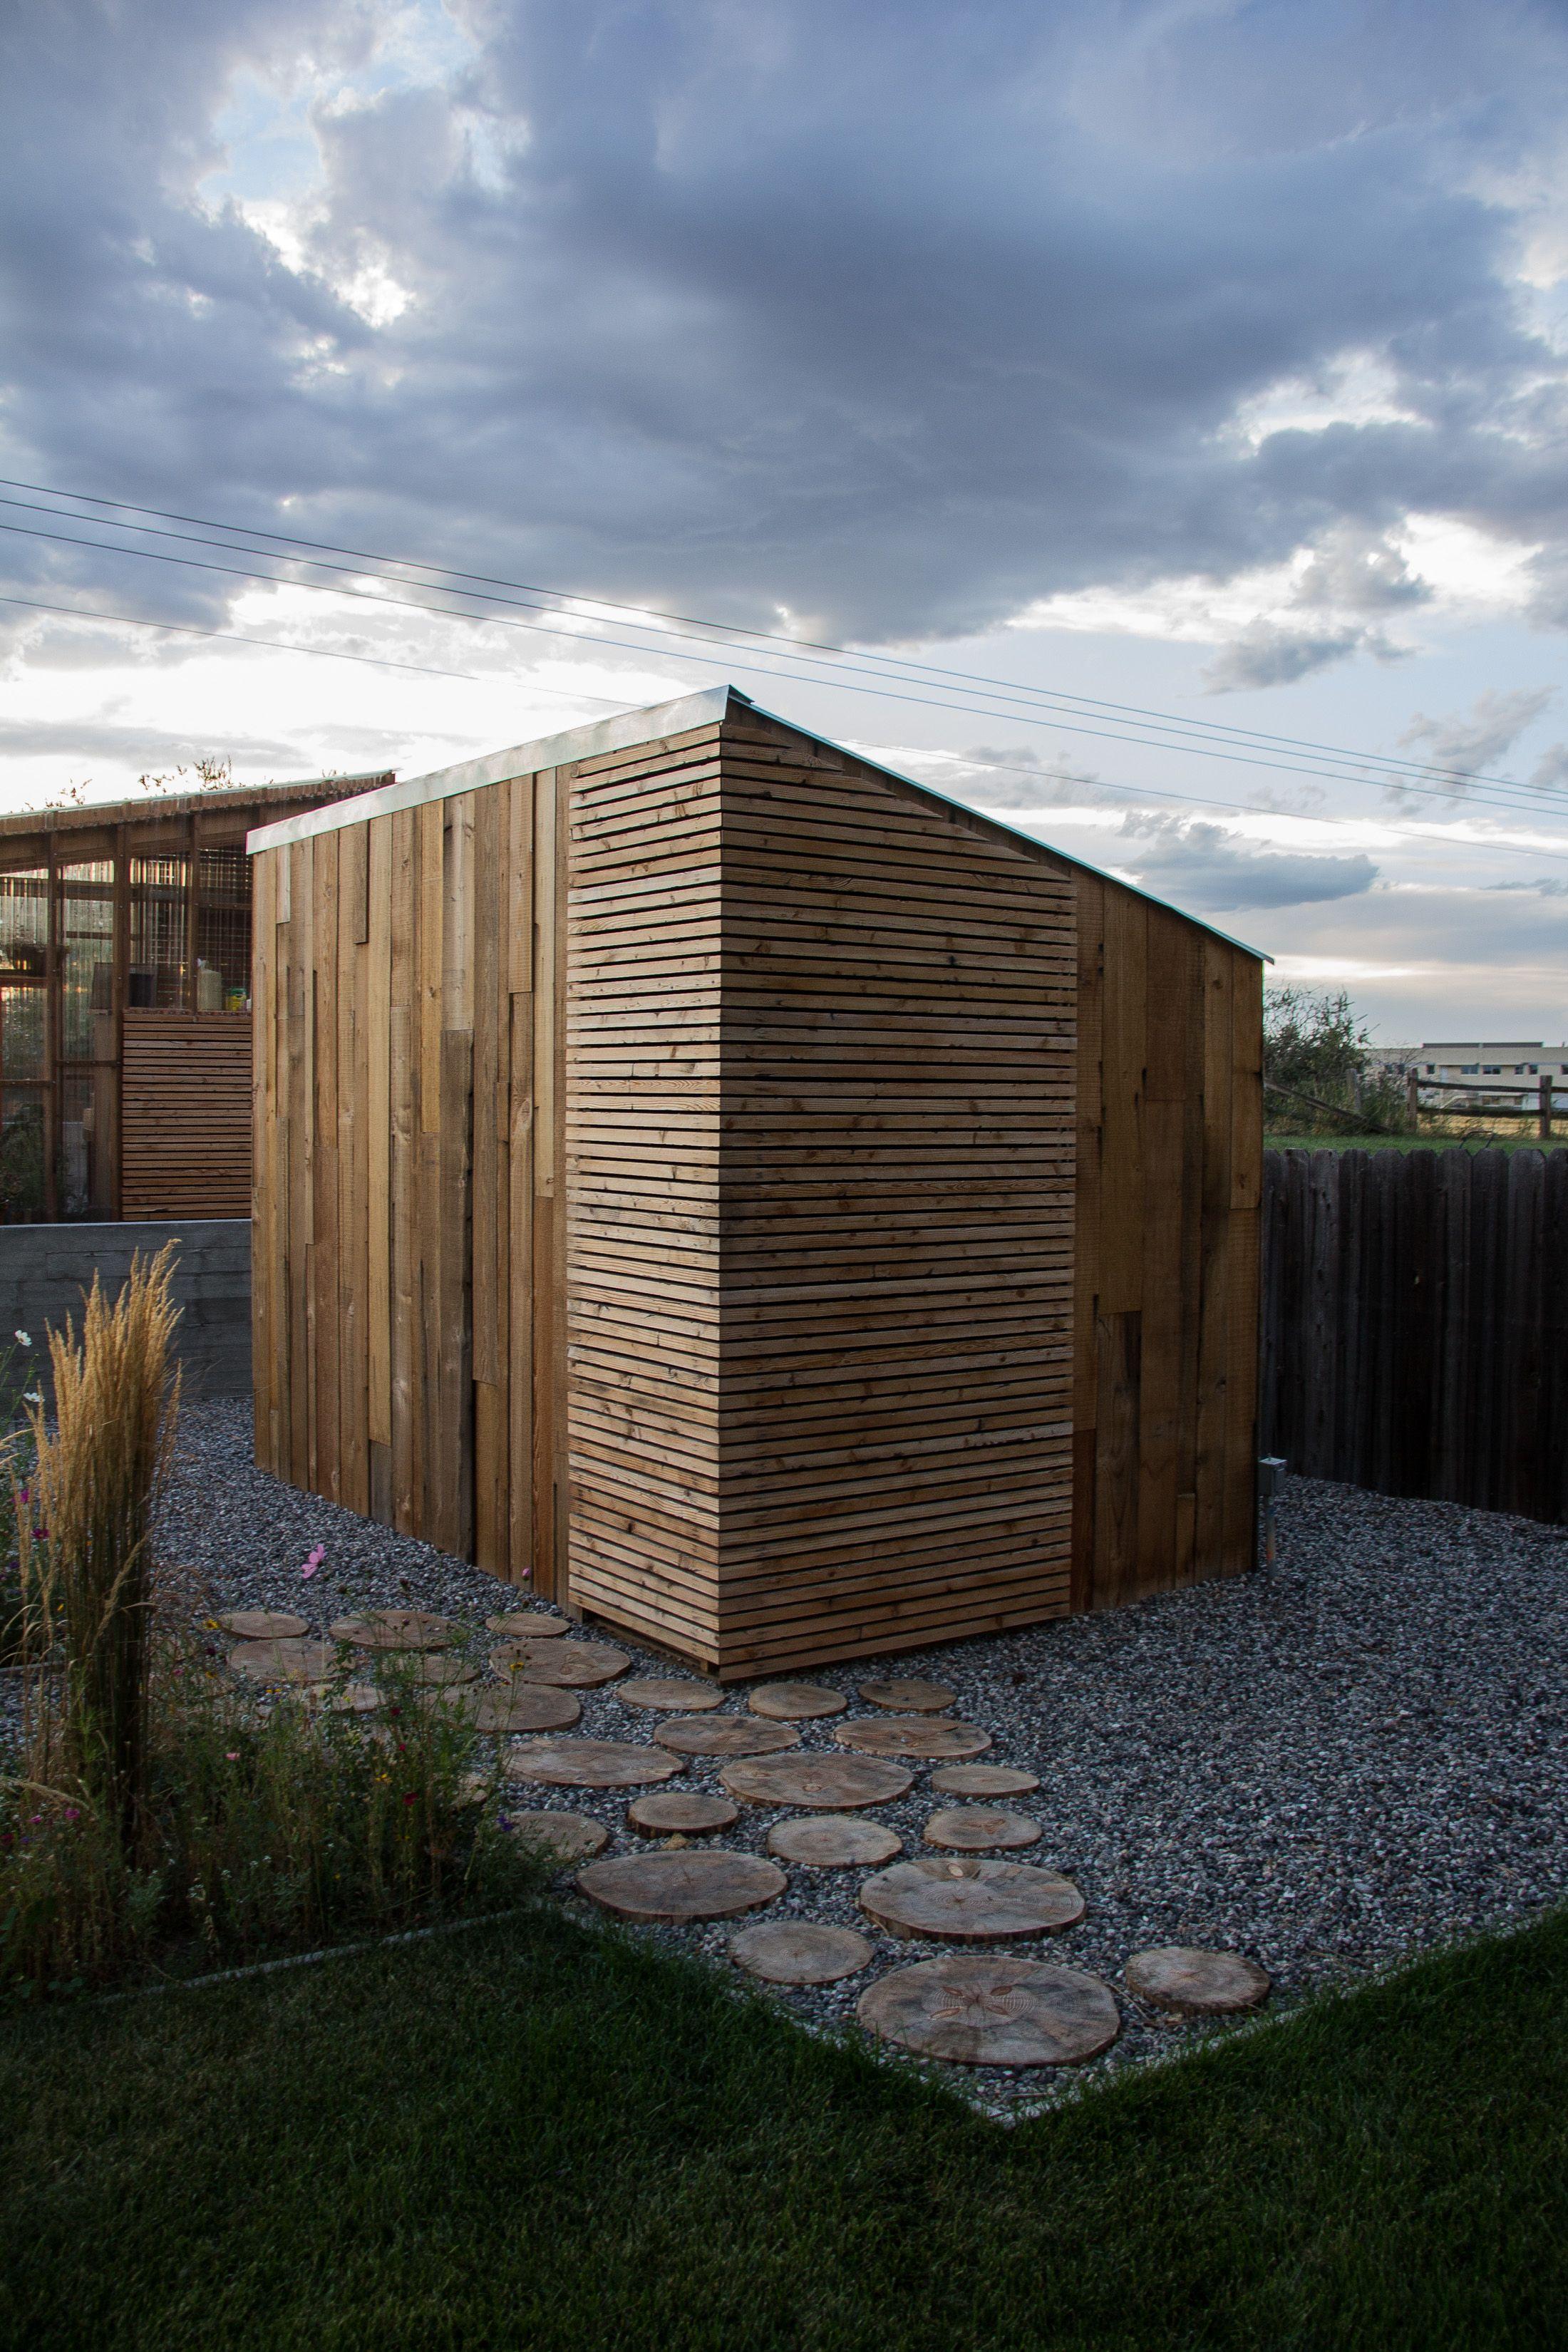 Good Design Collective | 2611 House Exterior | Pinterest: pinterest.com/pin/508273507916467254